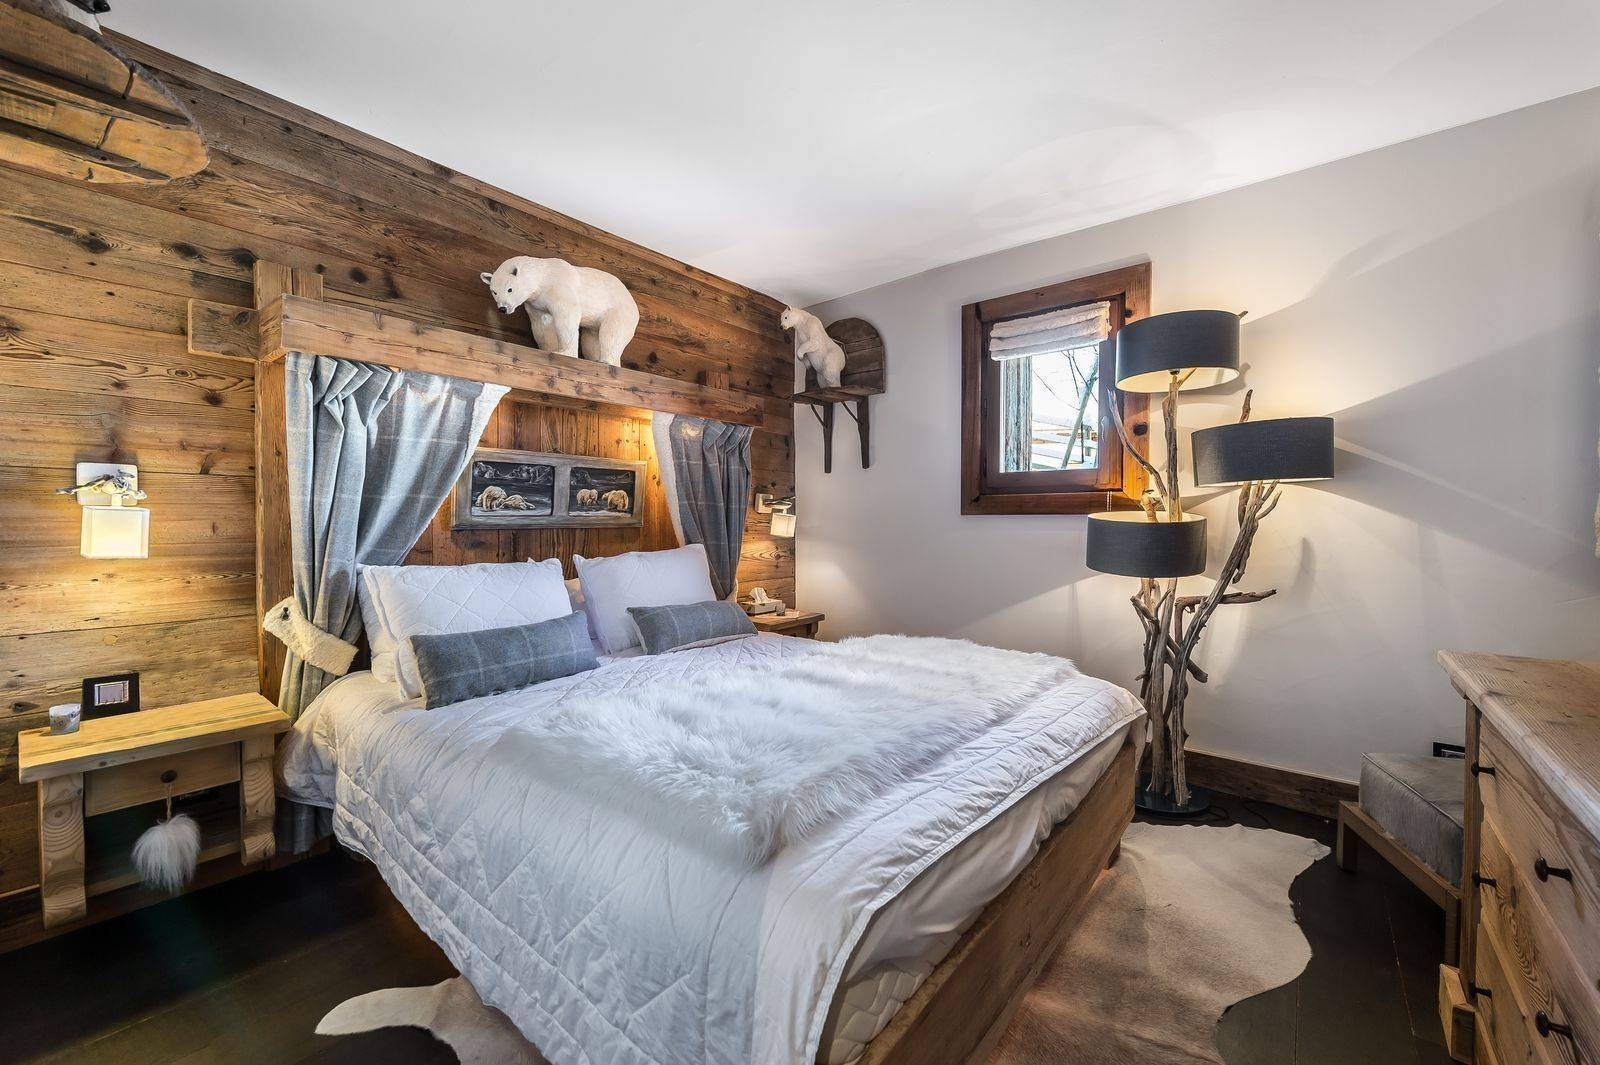 Courchevel 1550 Luxury Rental Chalet Niobite Bedroom 2